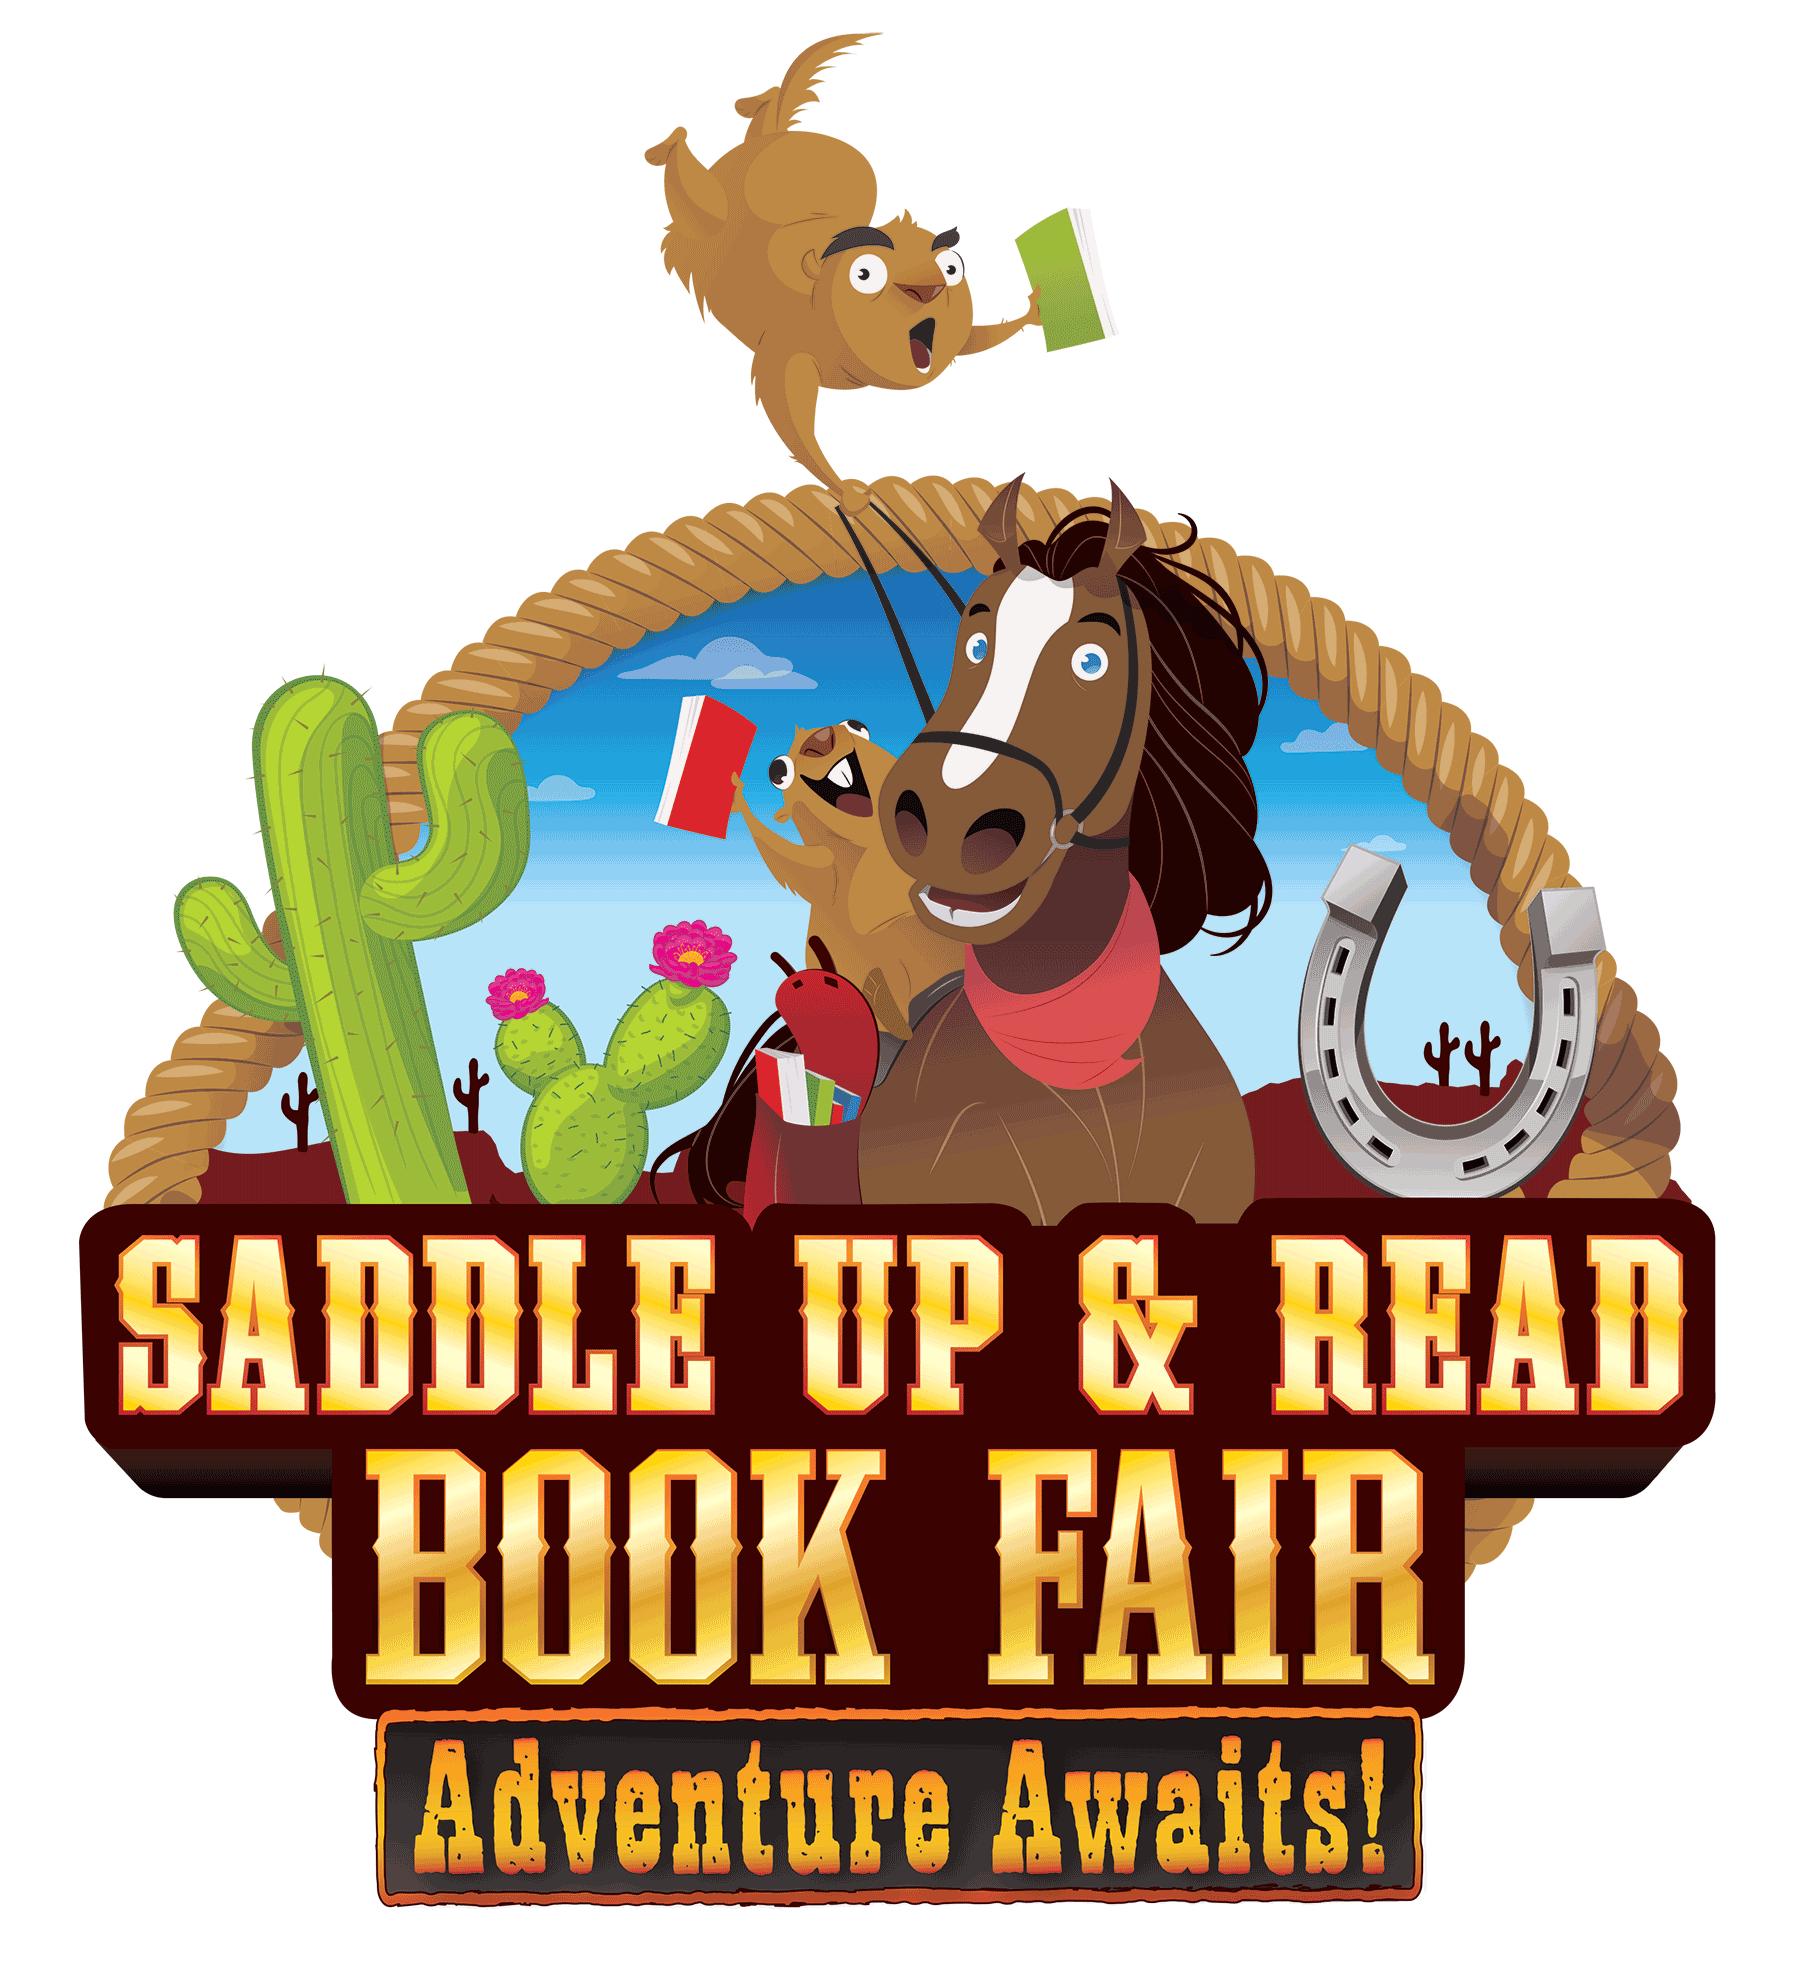 Festival clipart renaissance fair. Scholastic canada book fairs